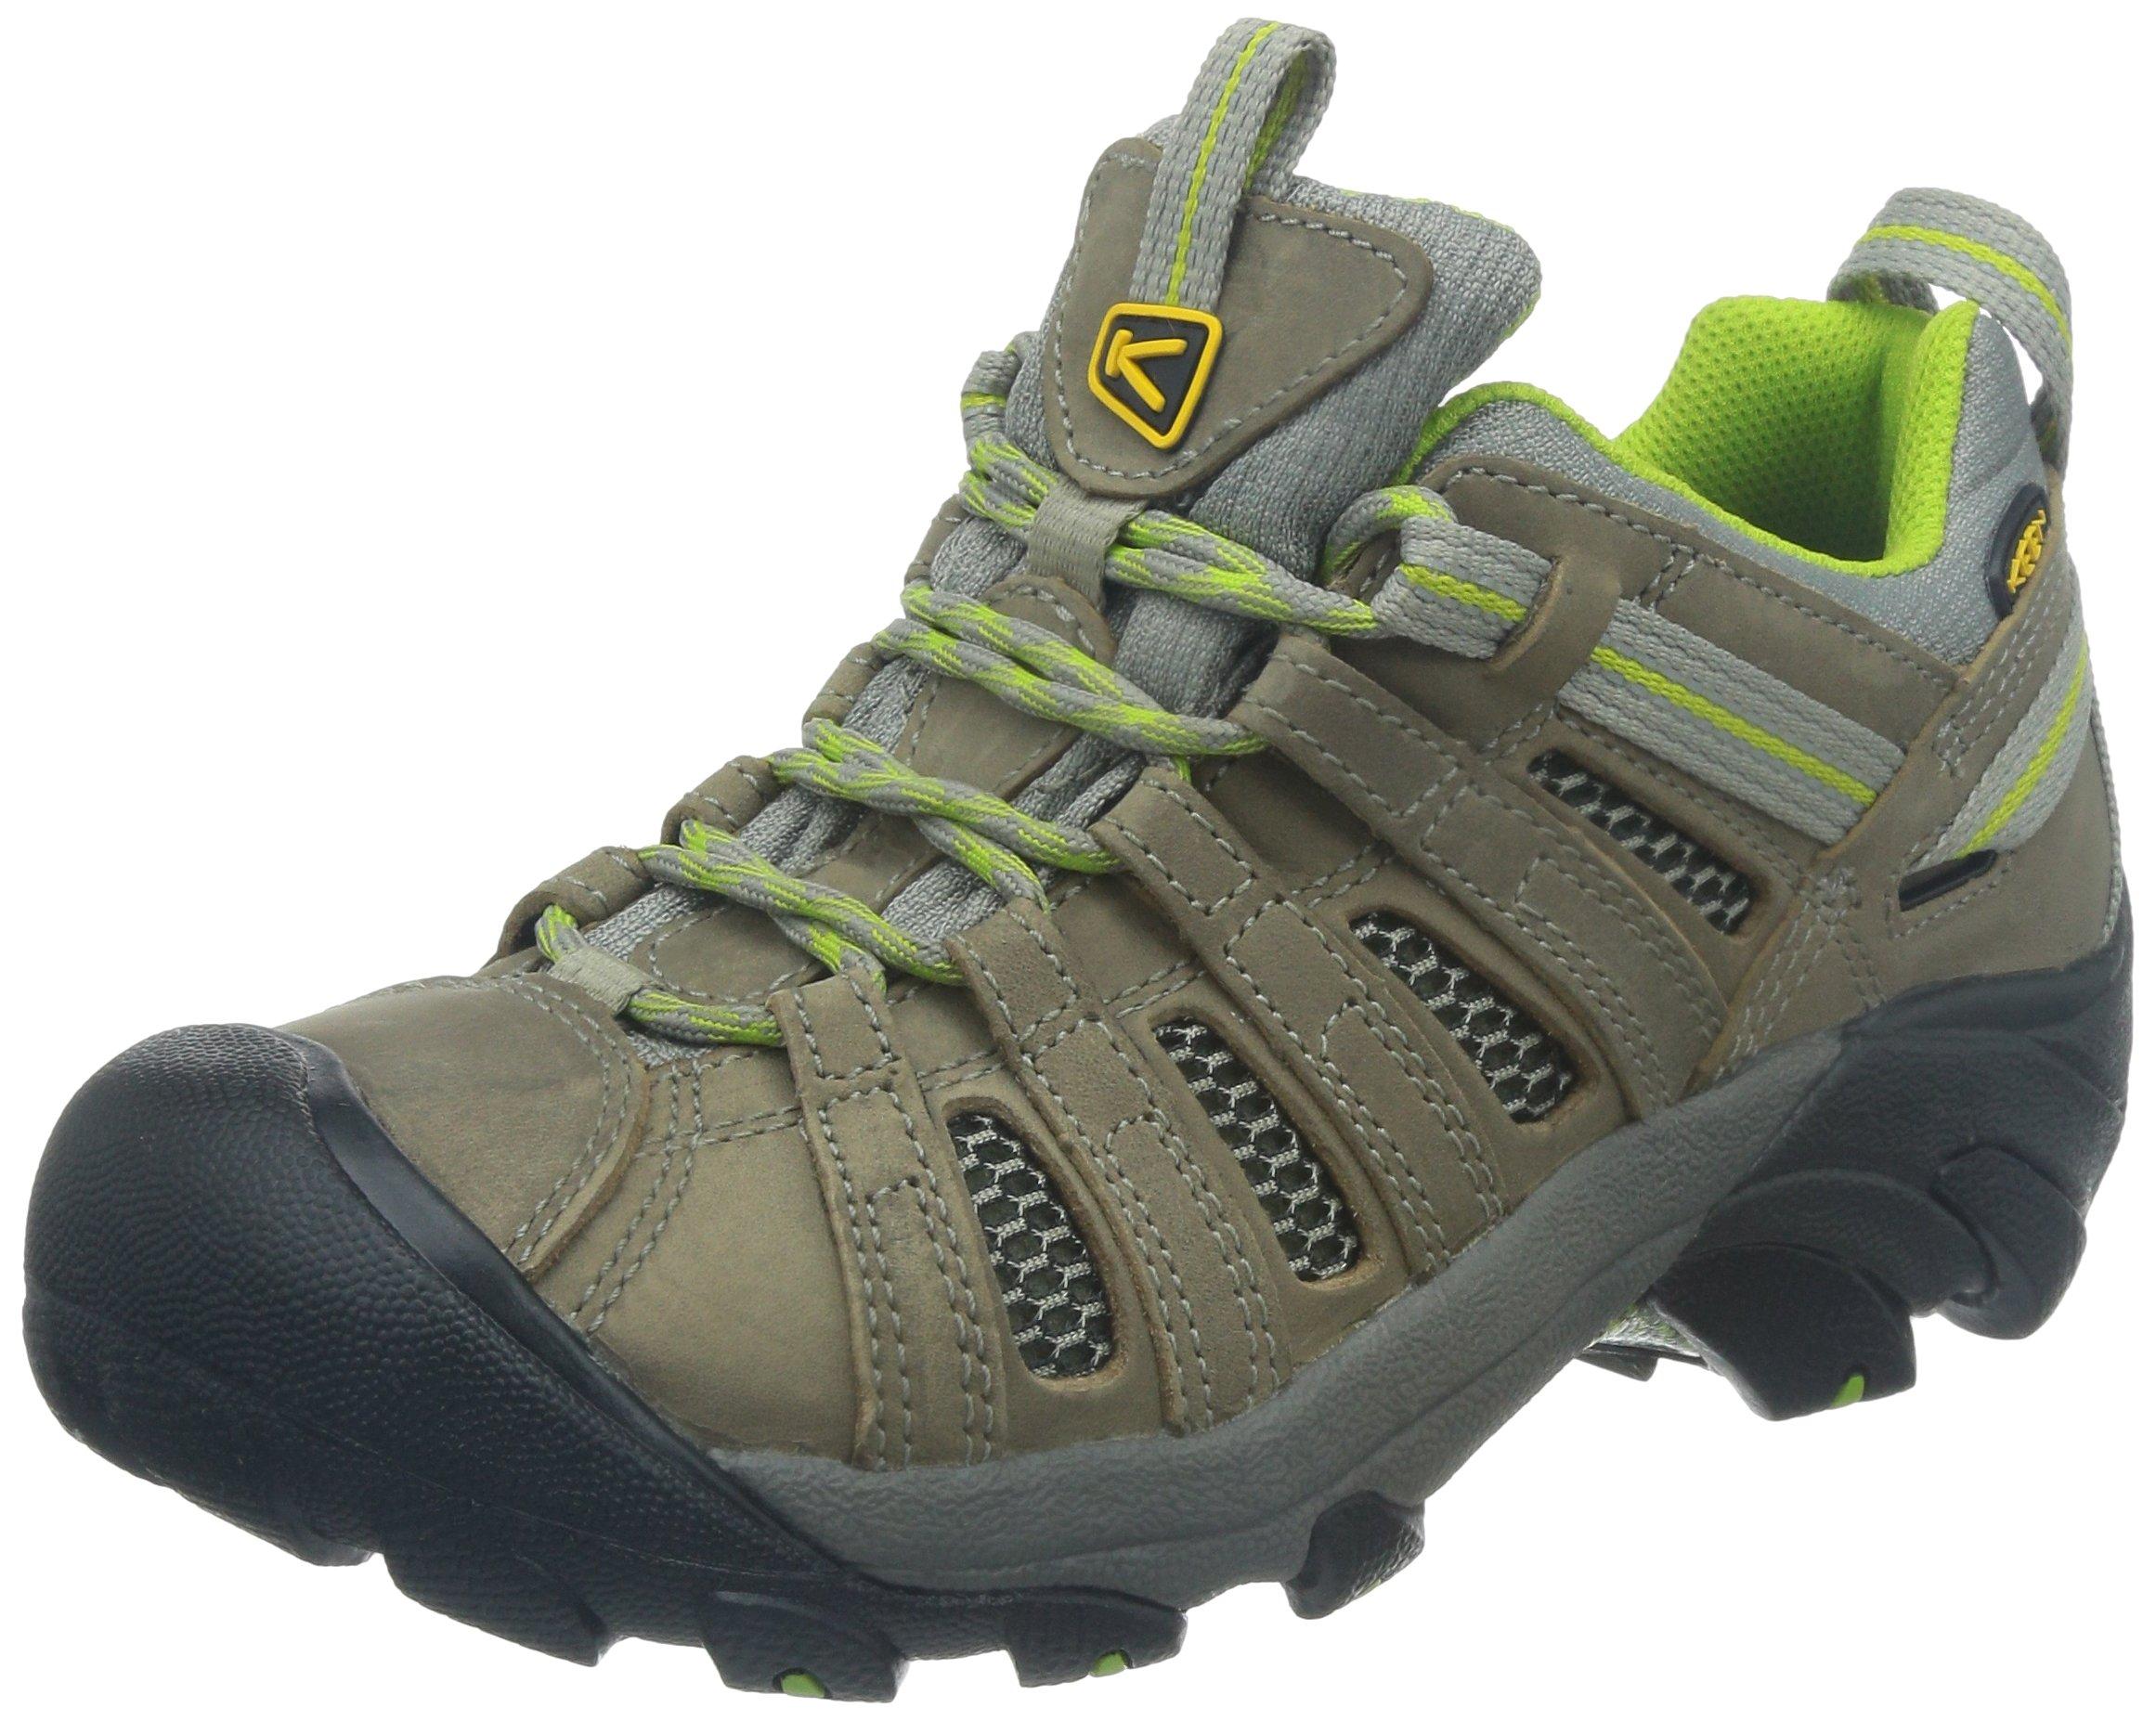 KEEN Women's Voyageur Hiking Shoe,Neutral Gray/Lime Green,5.5 M US